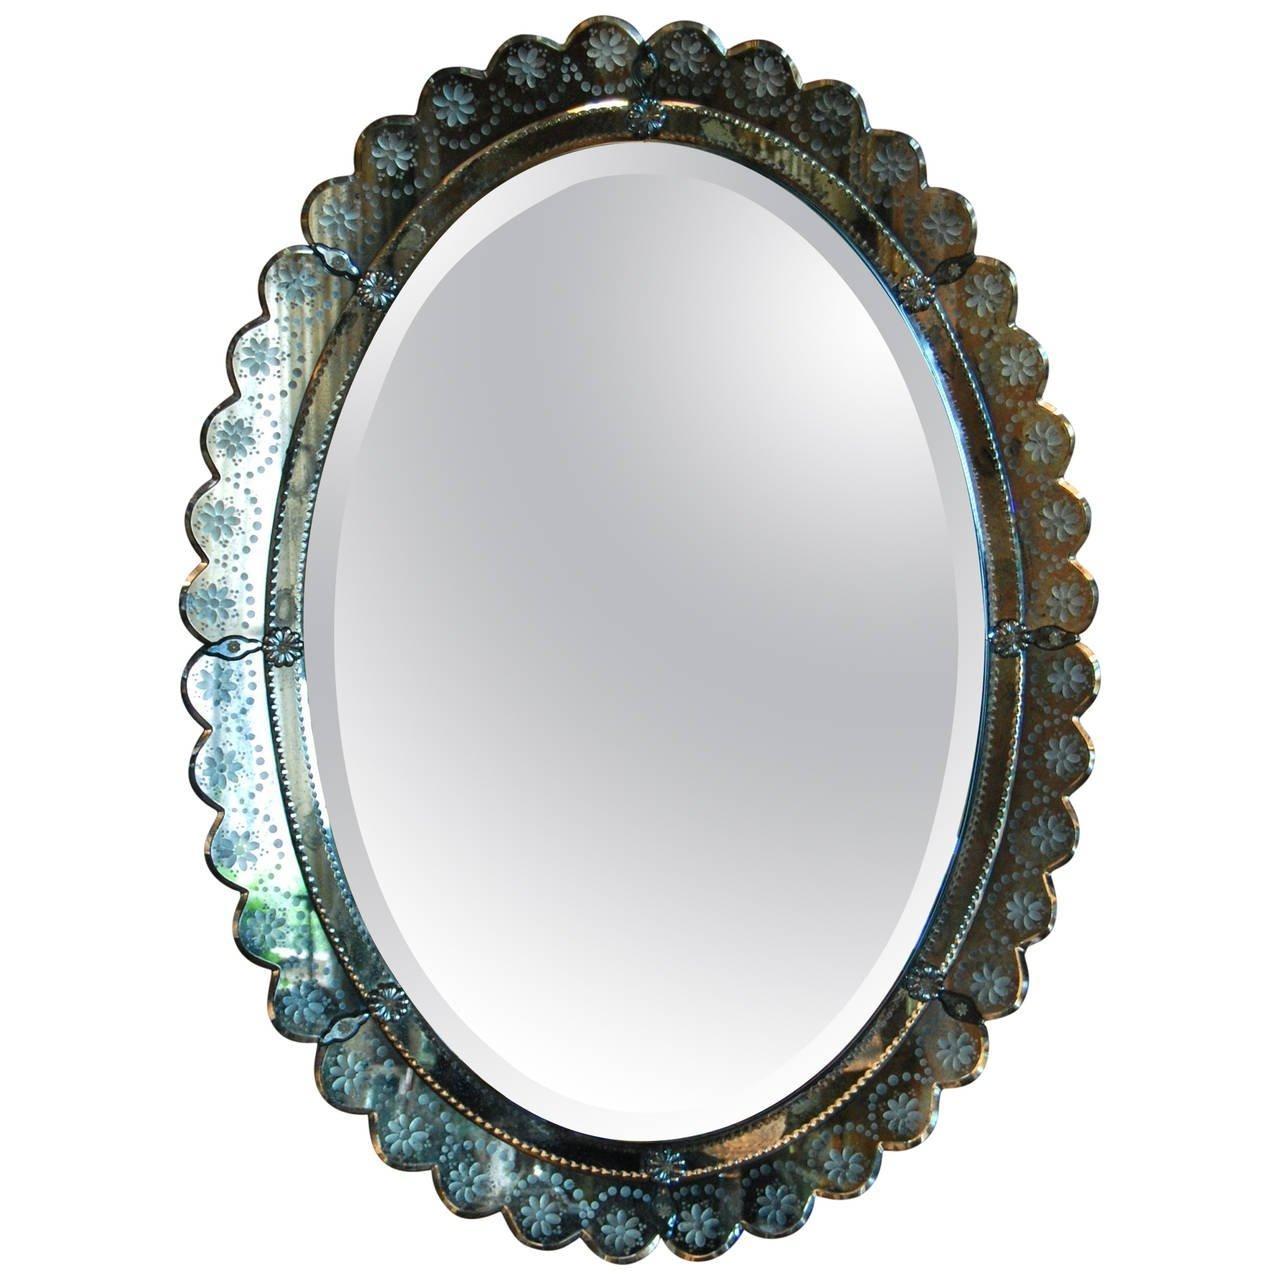 Oval Italian Art Deco Wall Mirror, Circa 1930 – 1940 For Sale At Within Art Deco Wall Mirror (Image 16 of 20)